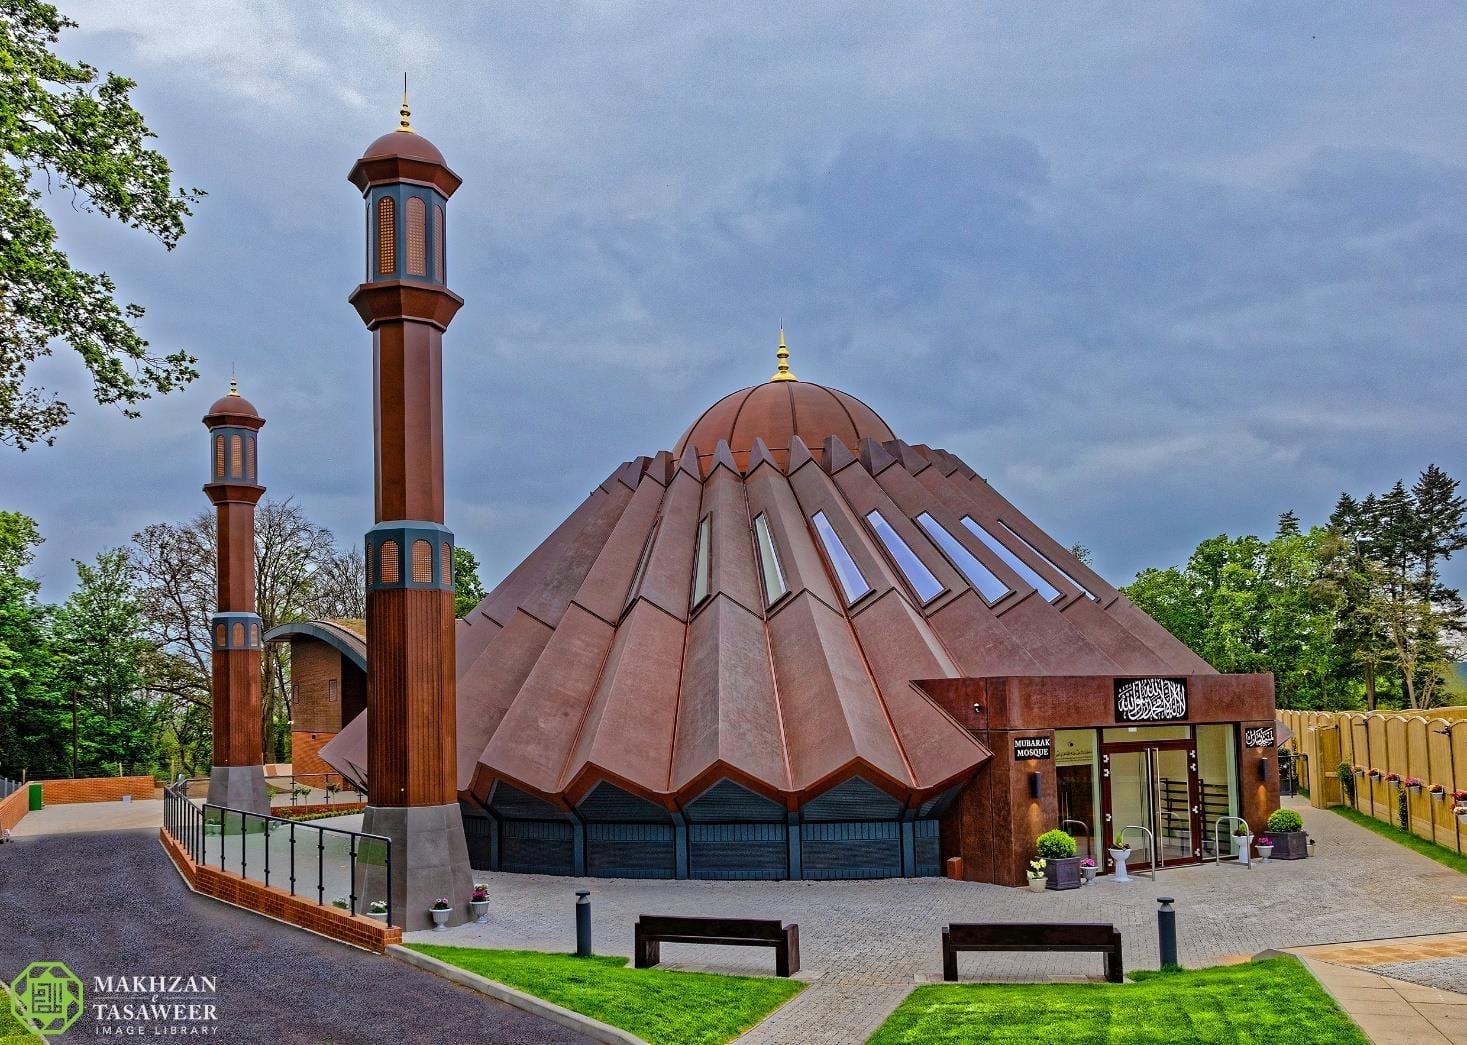 Ислам ыйман халифат мечит жума намаз ибадат сыйынуу хадис куран пайгамбар сахаба